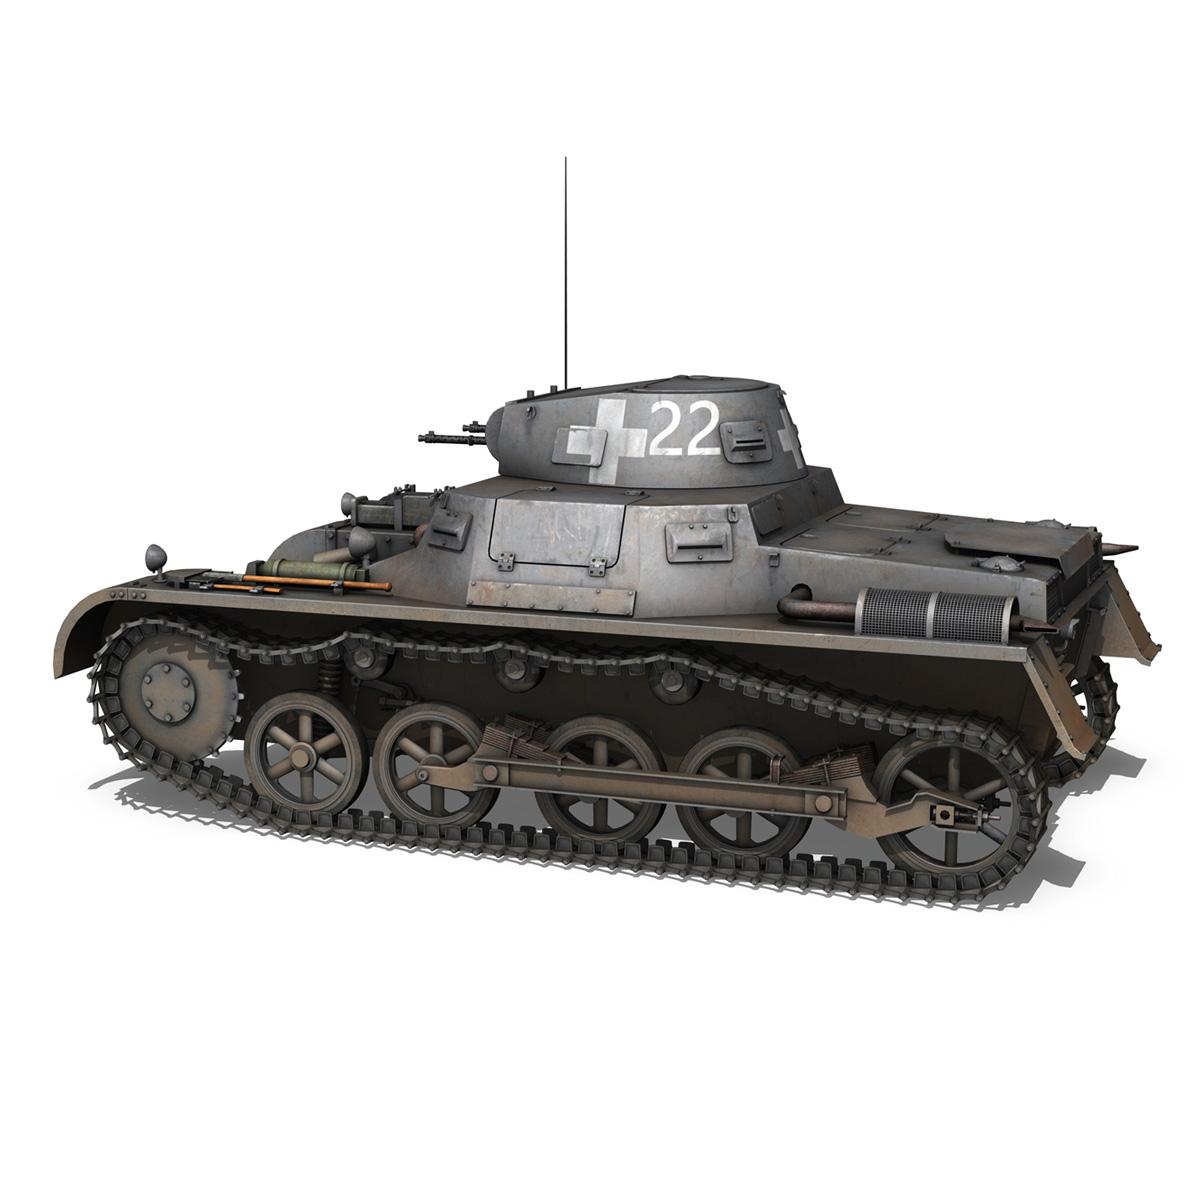 pzkpfw 1 - Panzer 1 - ausf. a - 22 3d modell 3ds fbx c4d lwo obj 186929